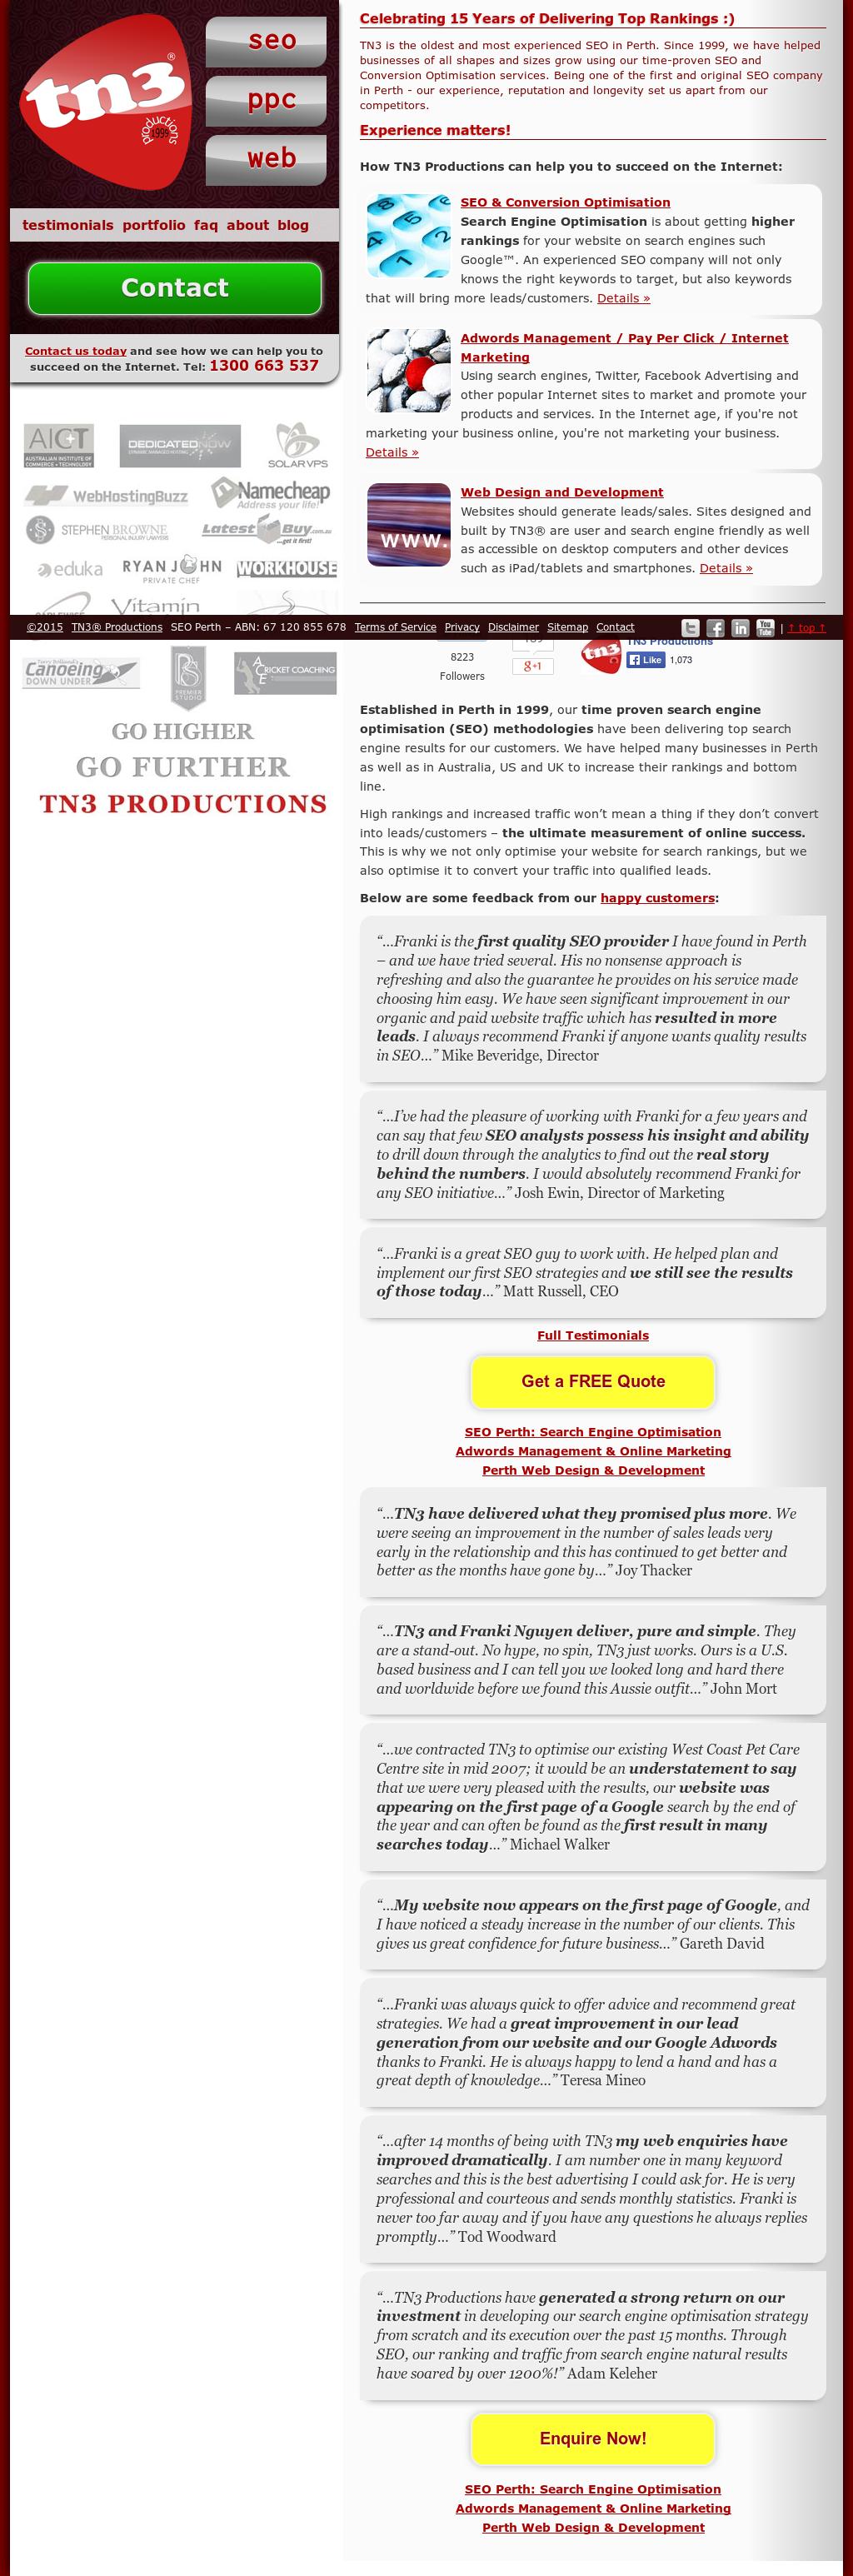 Tn3 Competitors, Revenue and Employees - Owler Company Profile